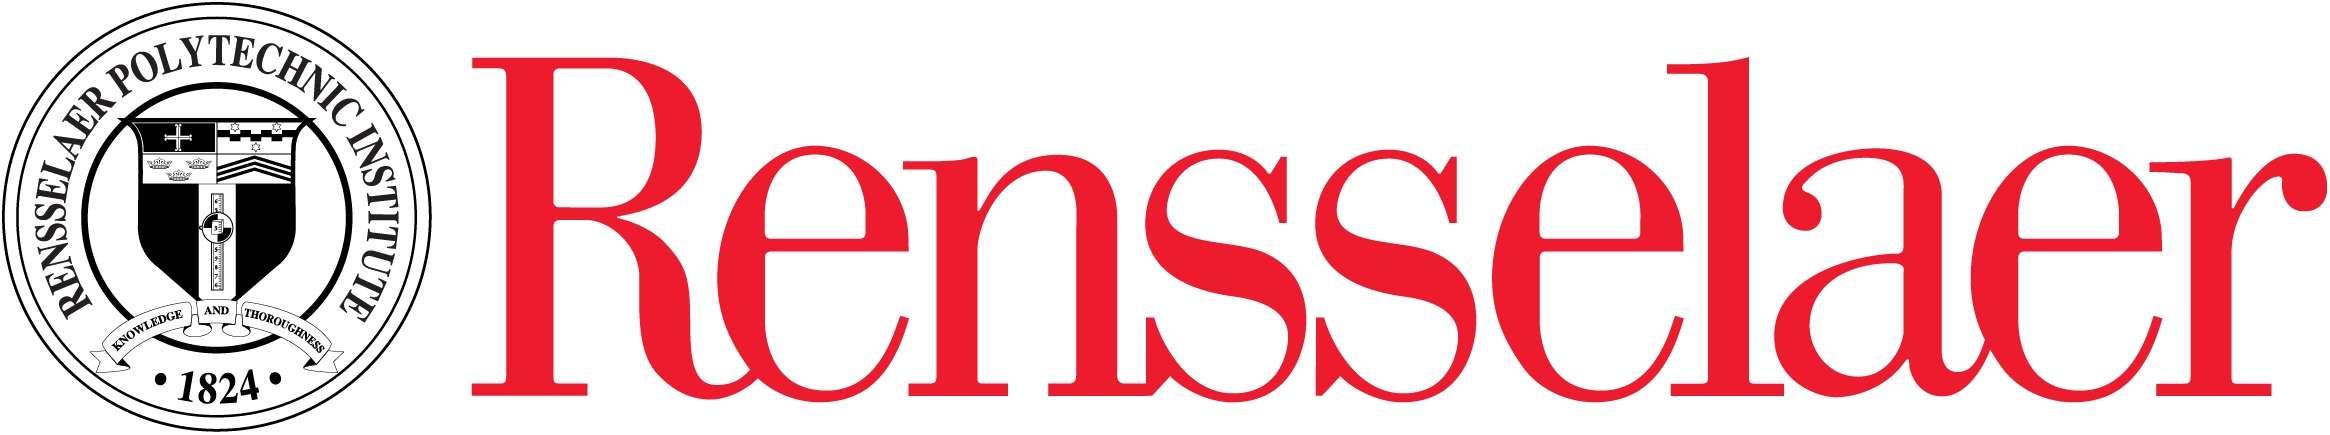 RPI Logo&Seal [Rensselaer Polytechnic Institute] png